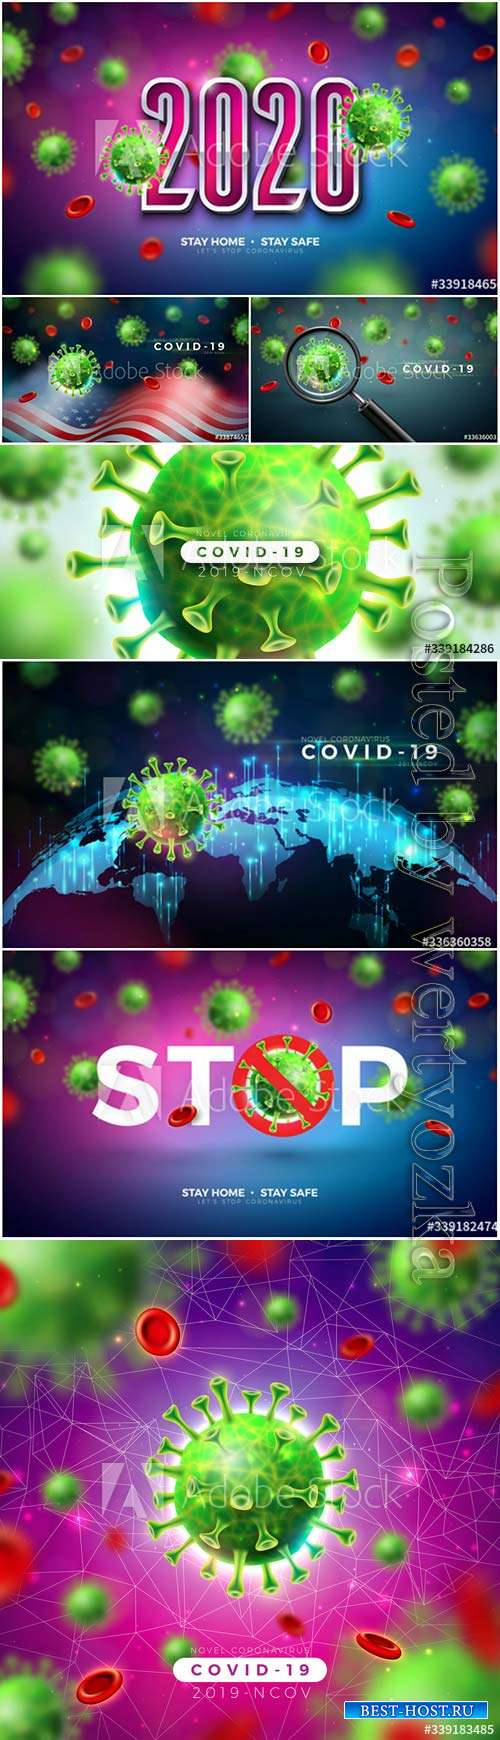 Stay home, stop coronavirus vector design